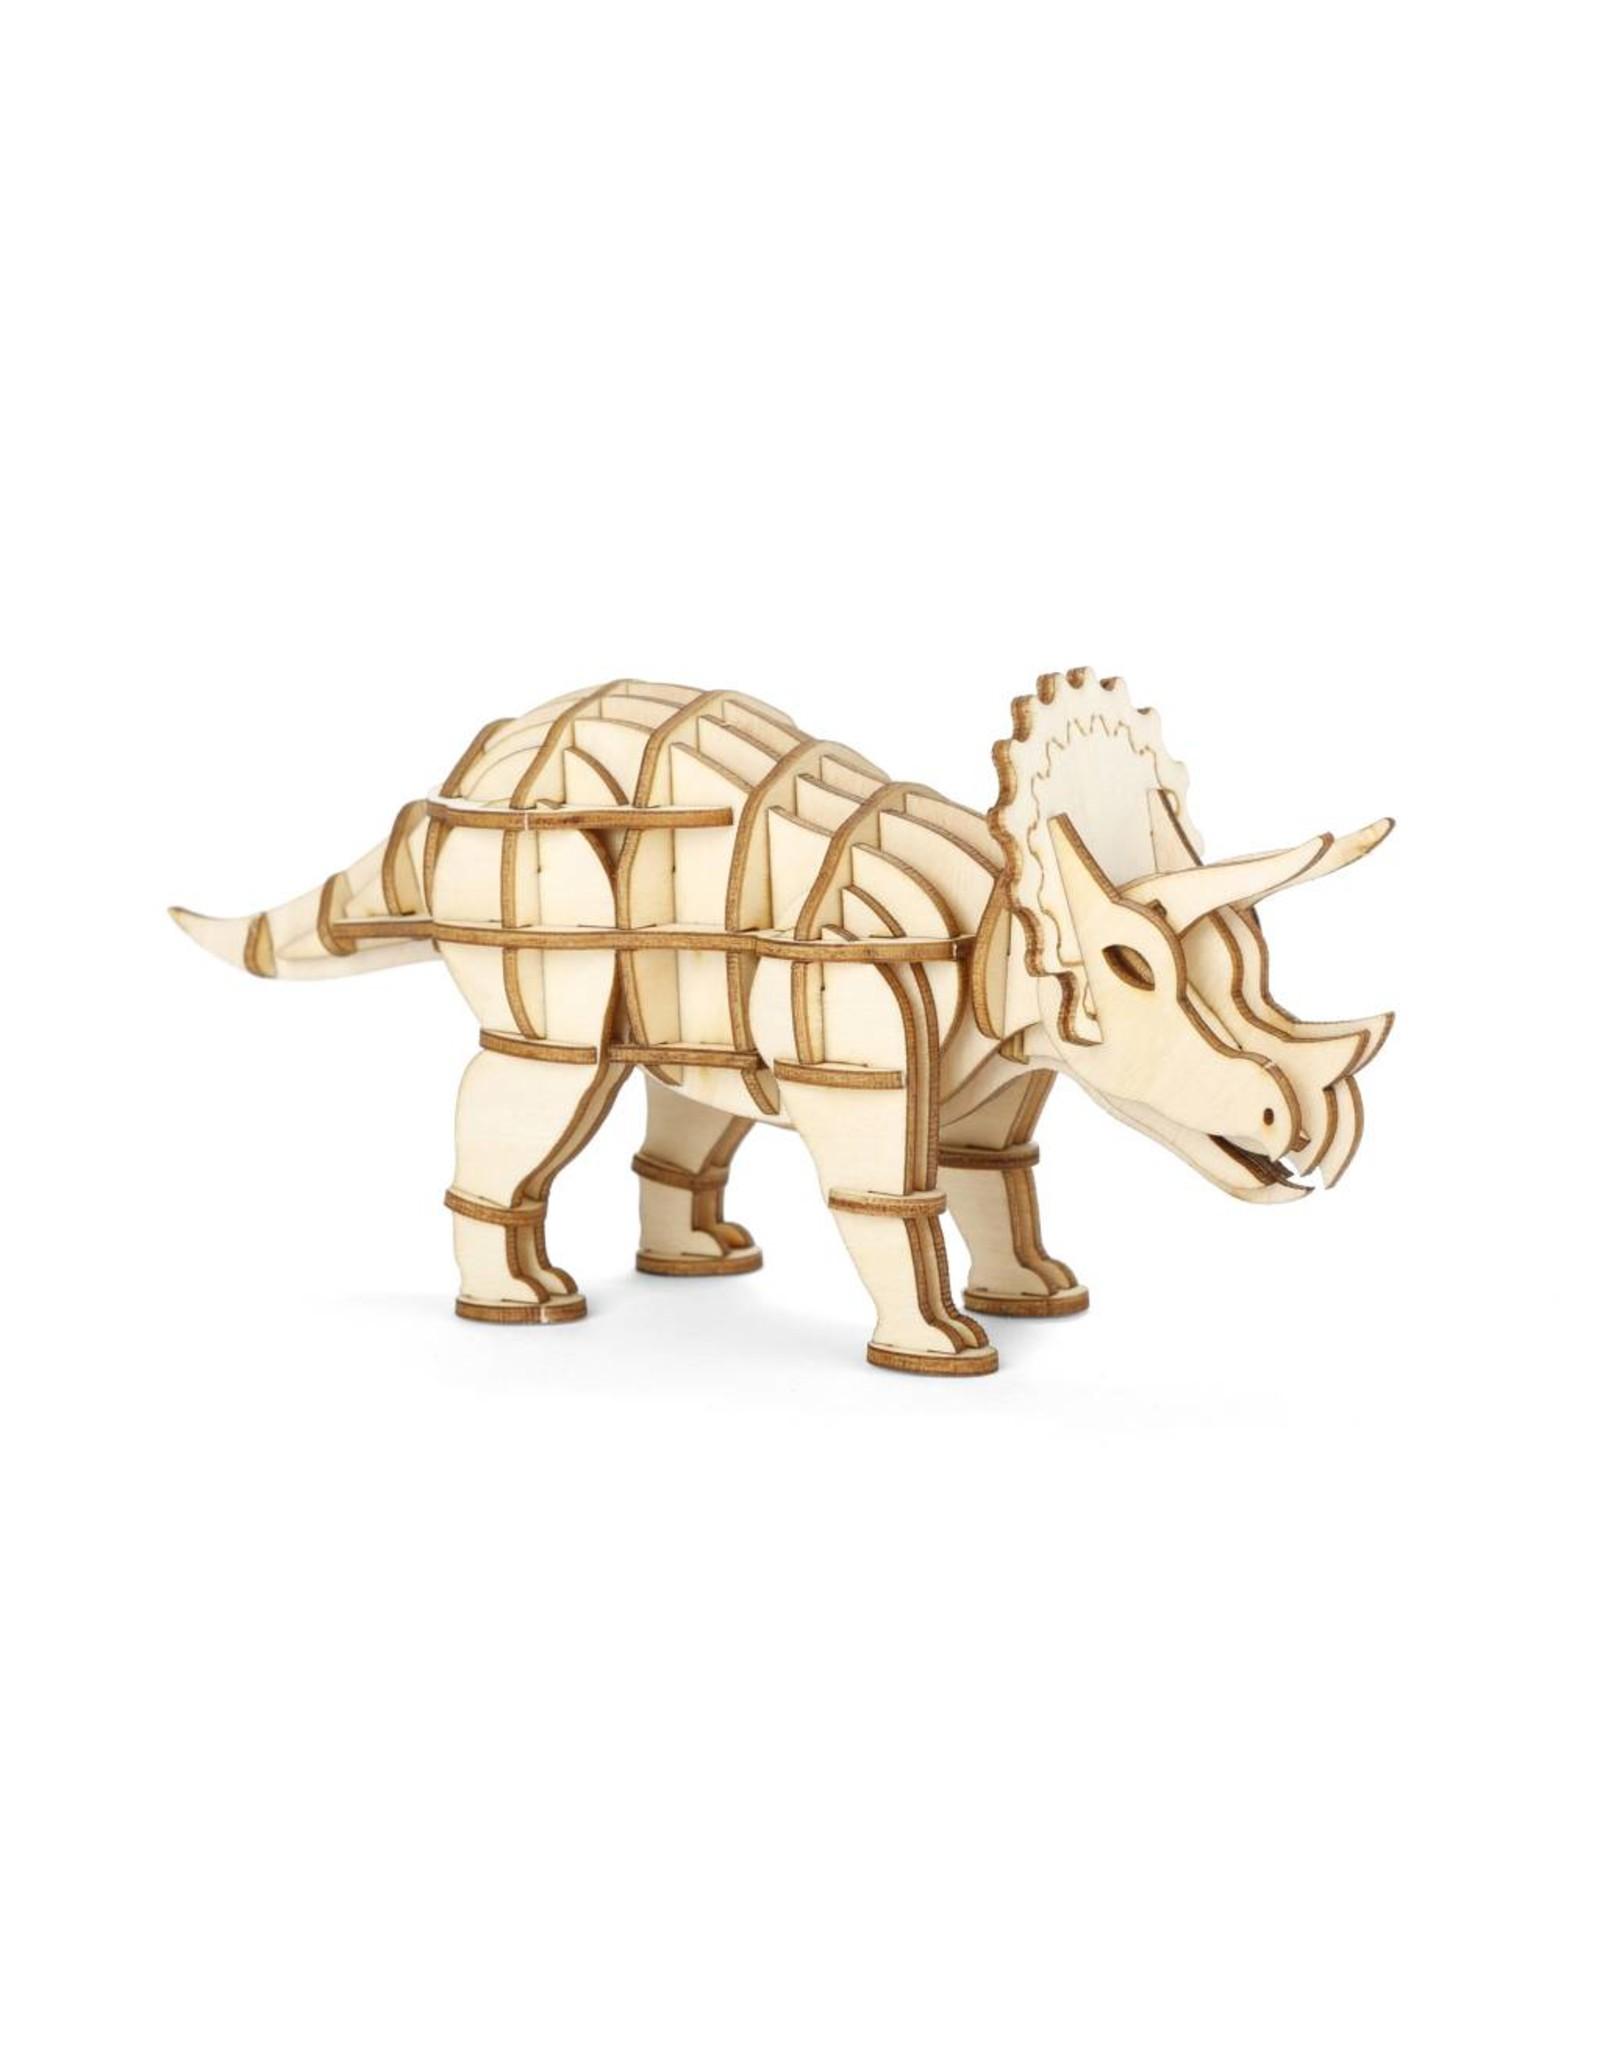 3D houten puzzel  - triceratops